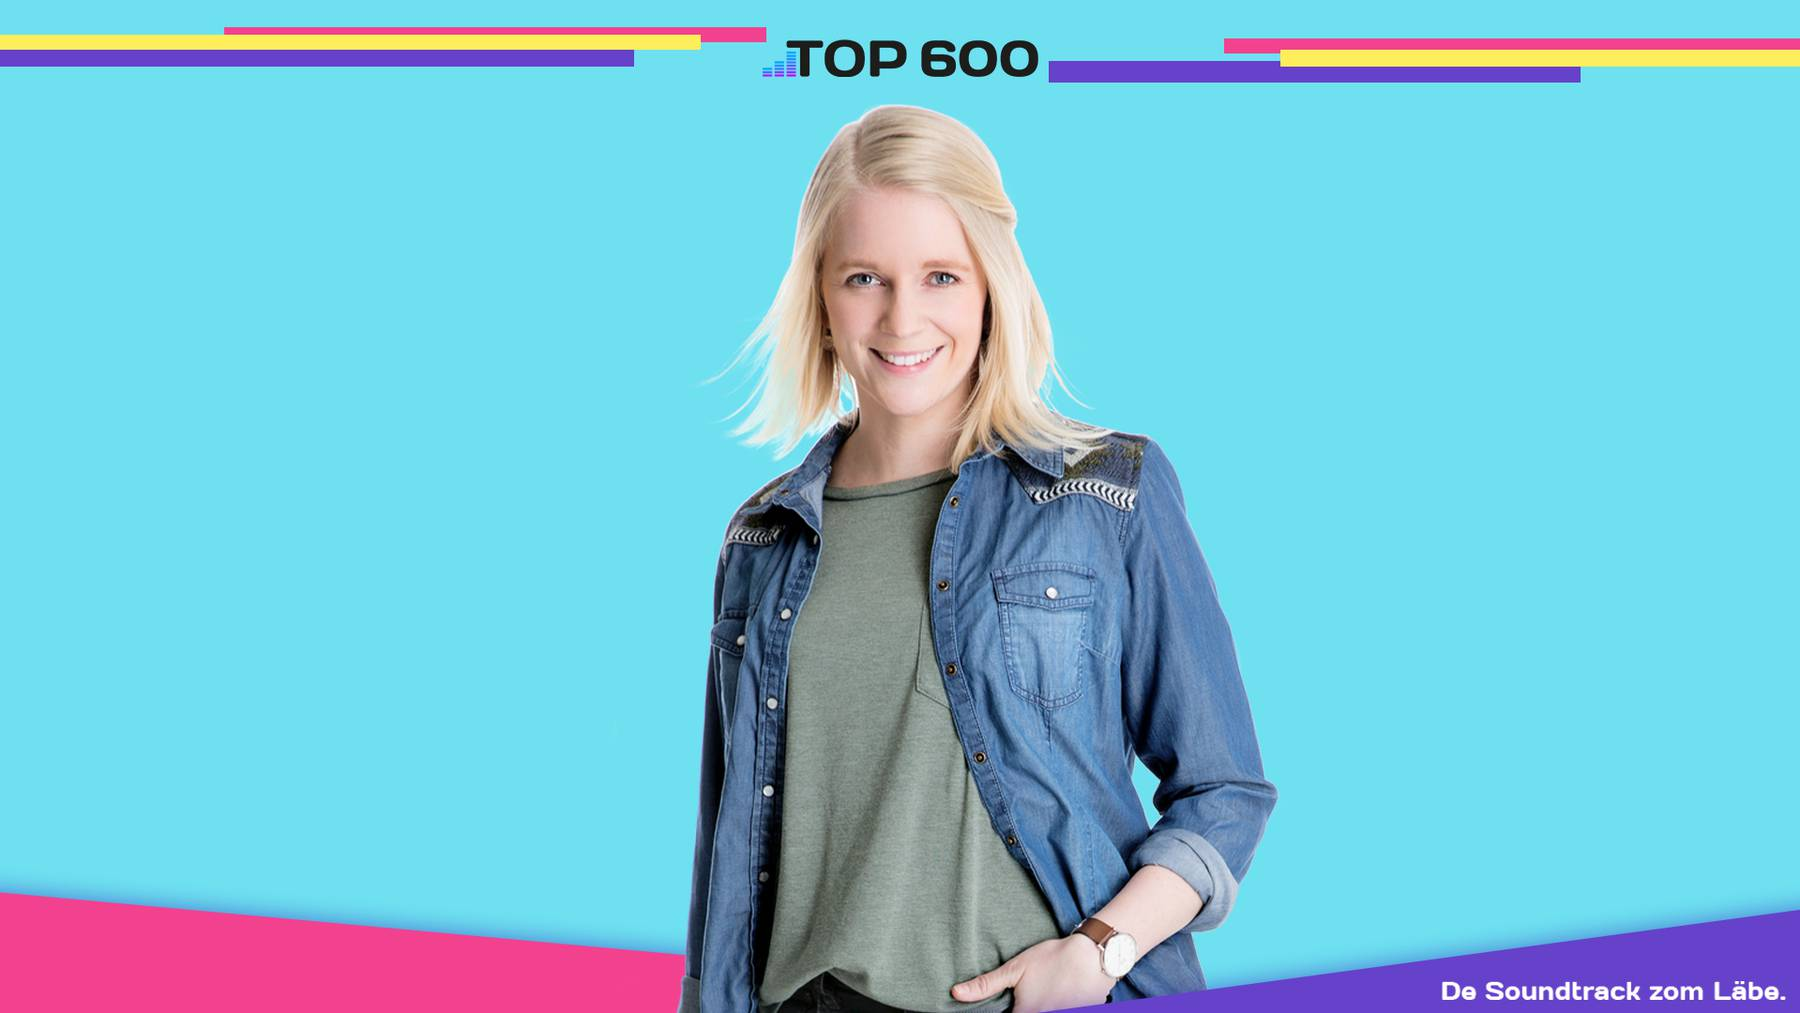 Asset Sonja Top 600